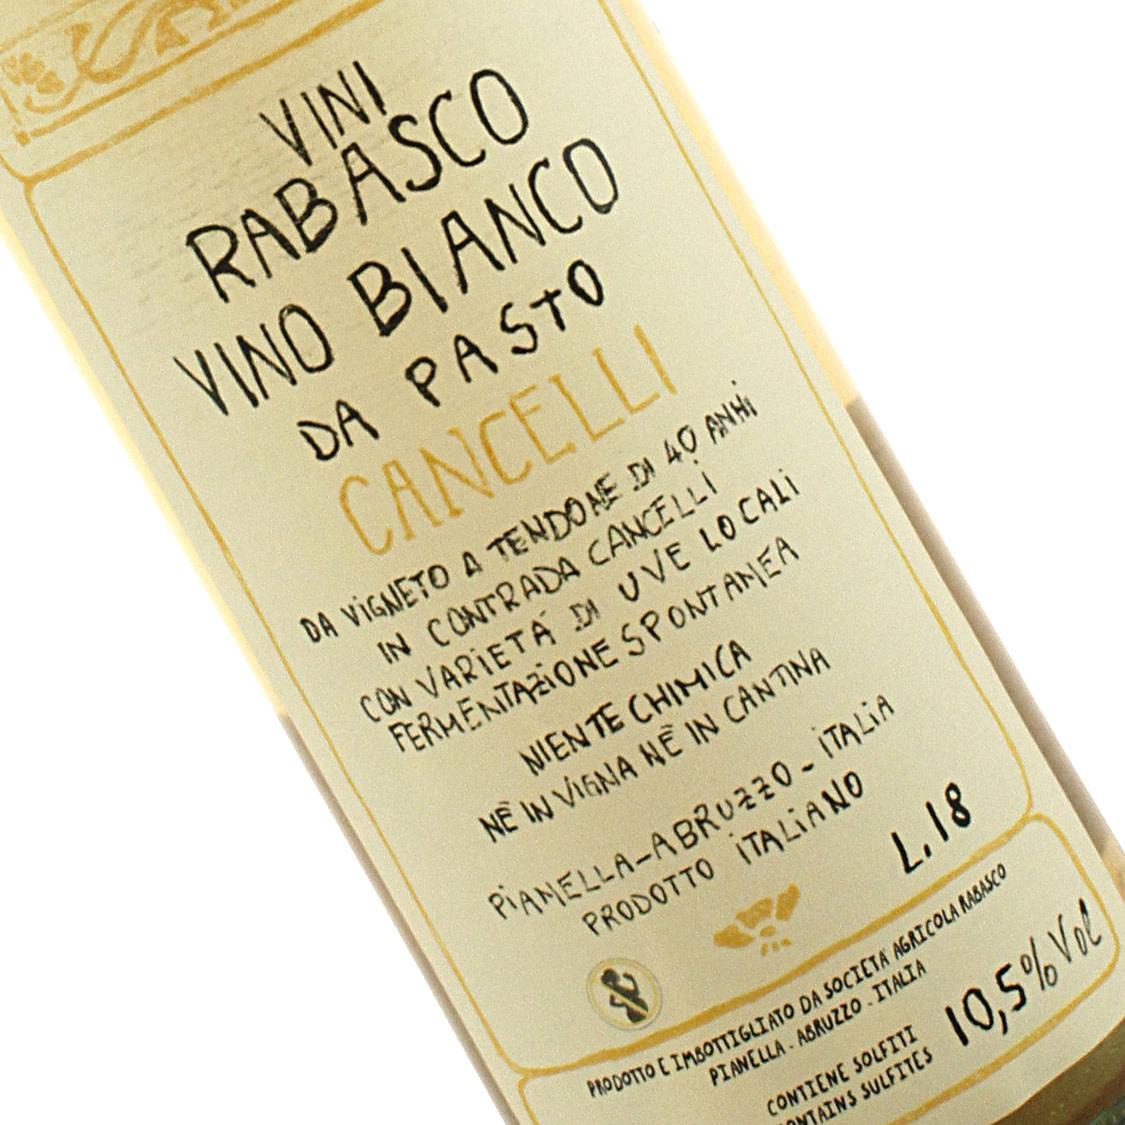 Rabasco 2018 Vino Bianco Da Pasto Cancelli , Abruzzo